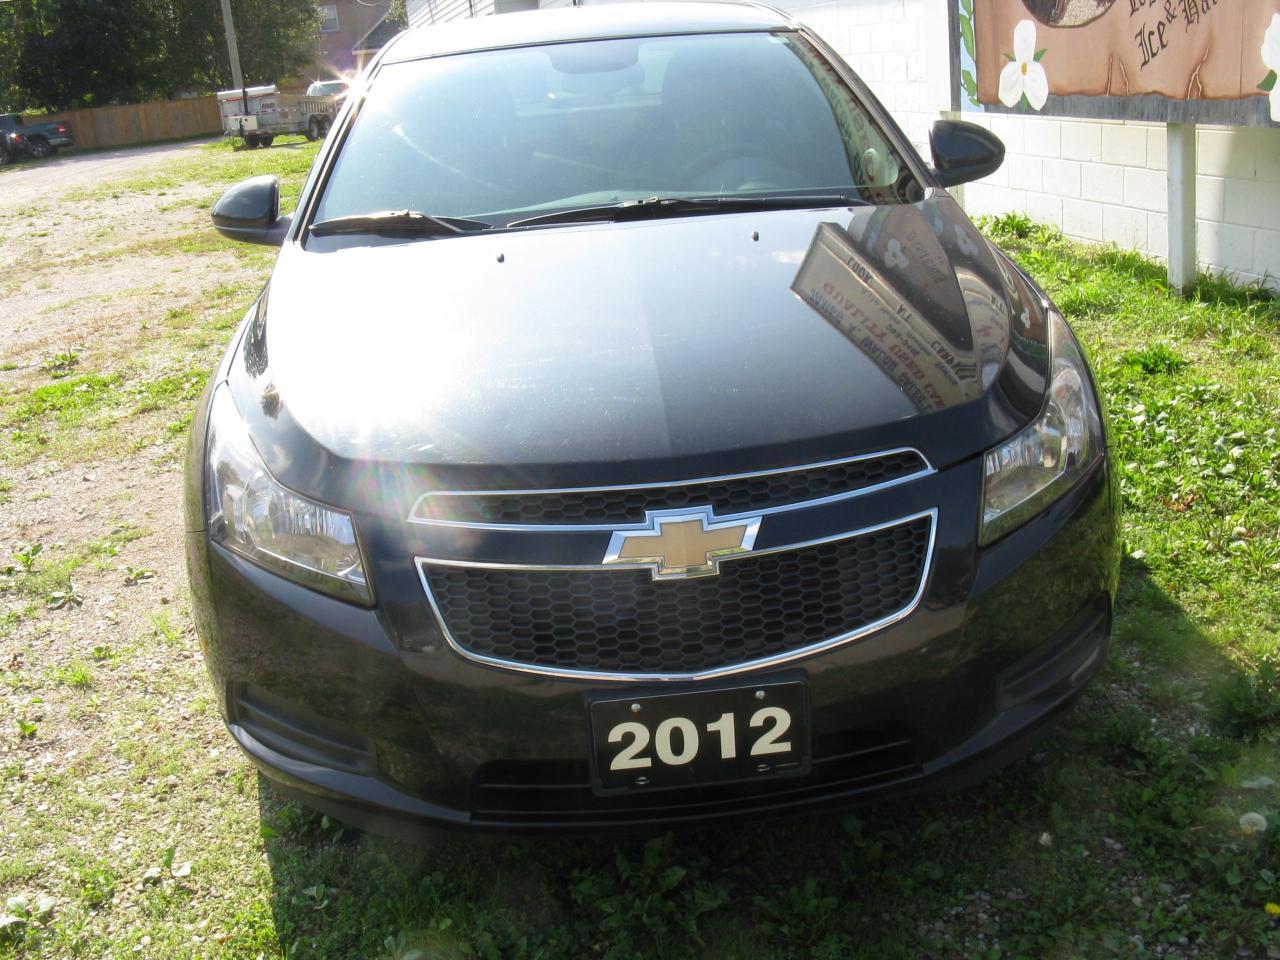 Photo of Black 2012 Chevrolet Cruze